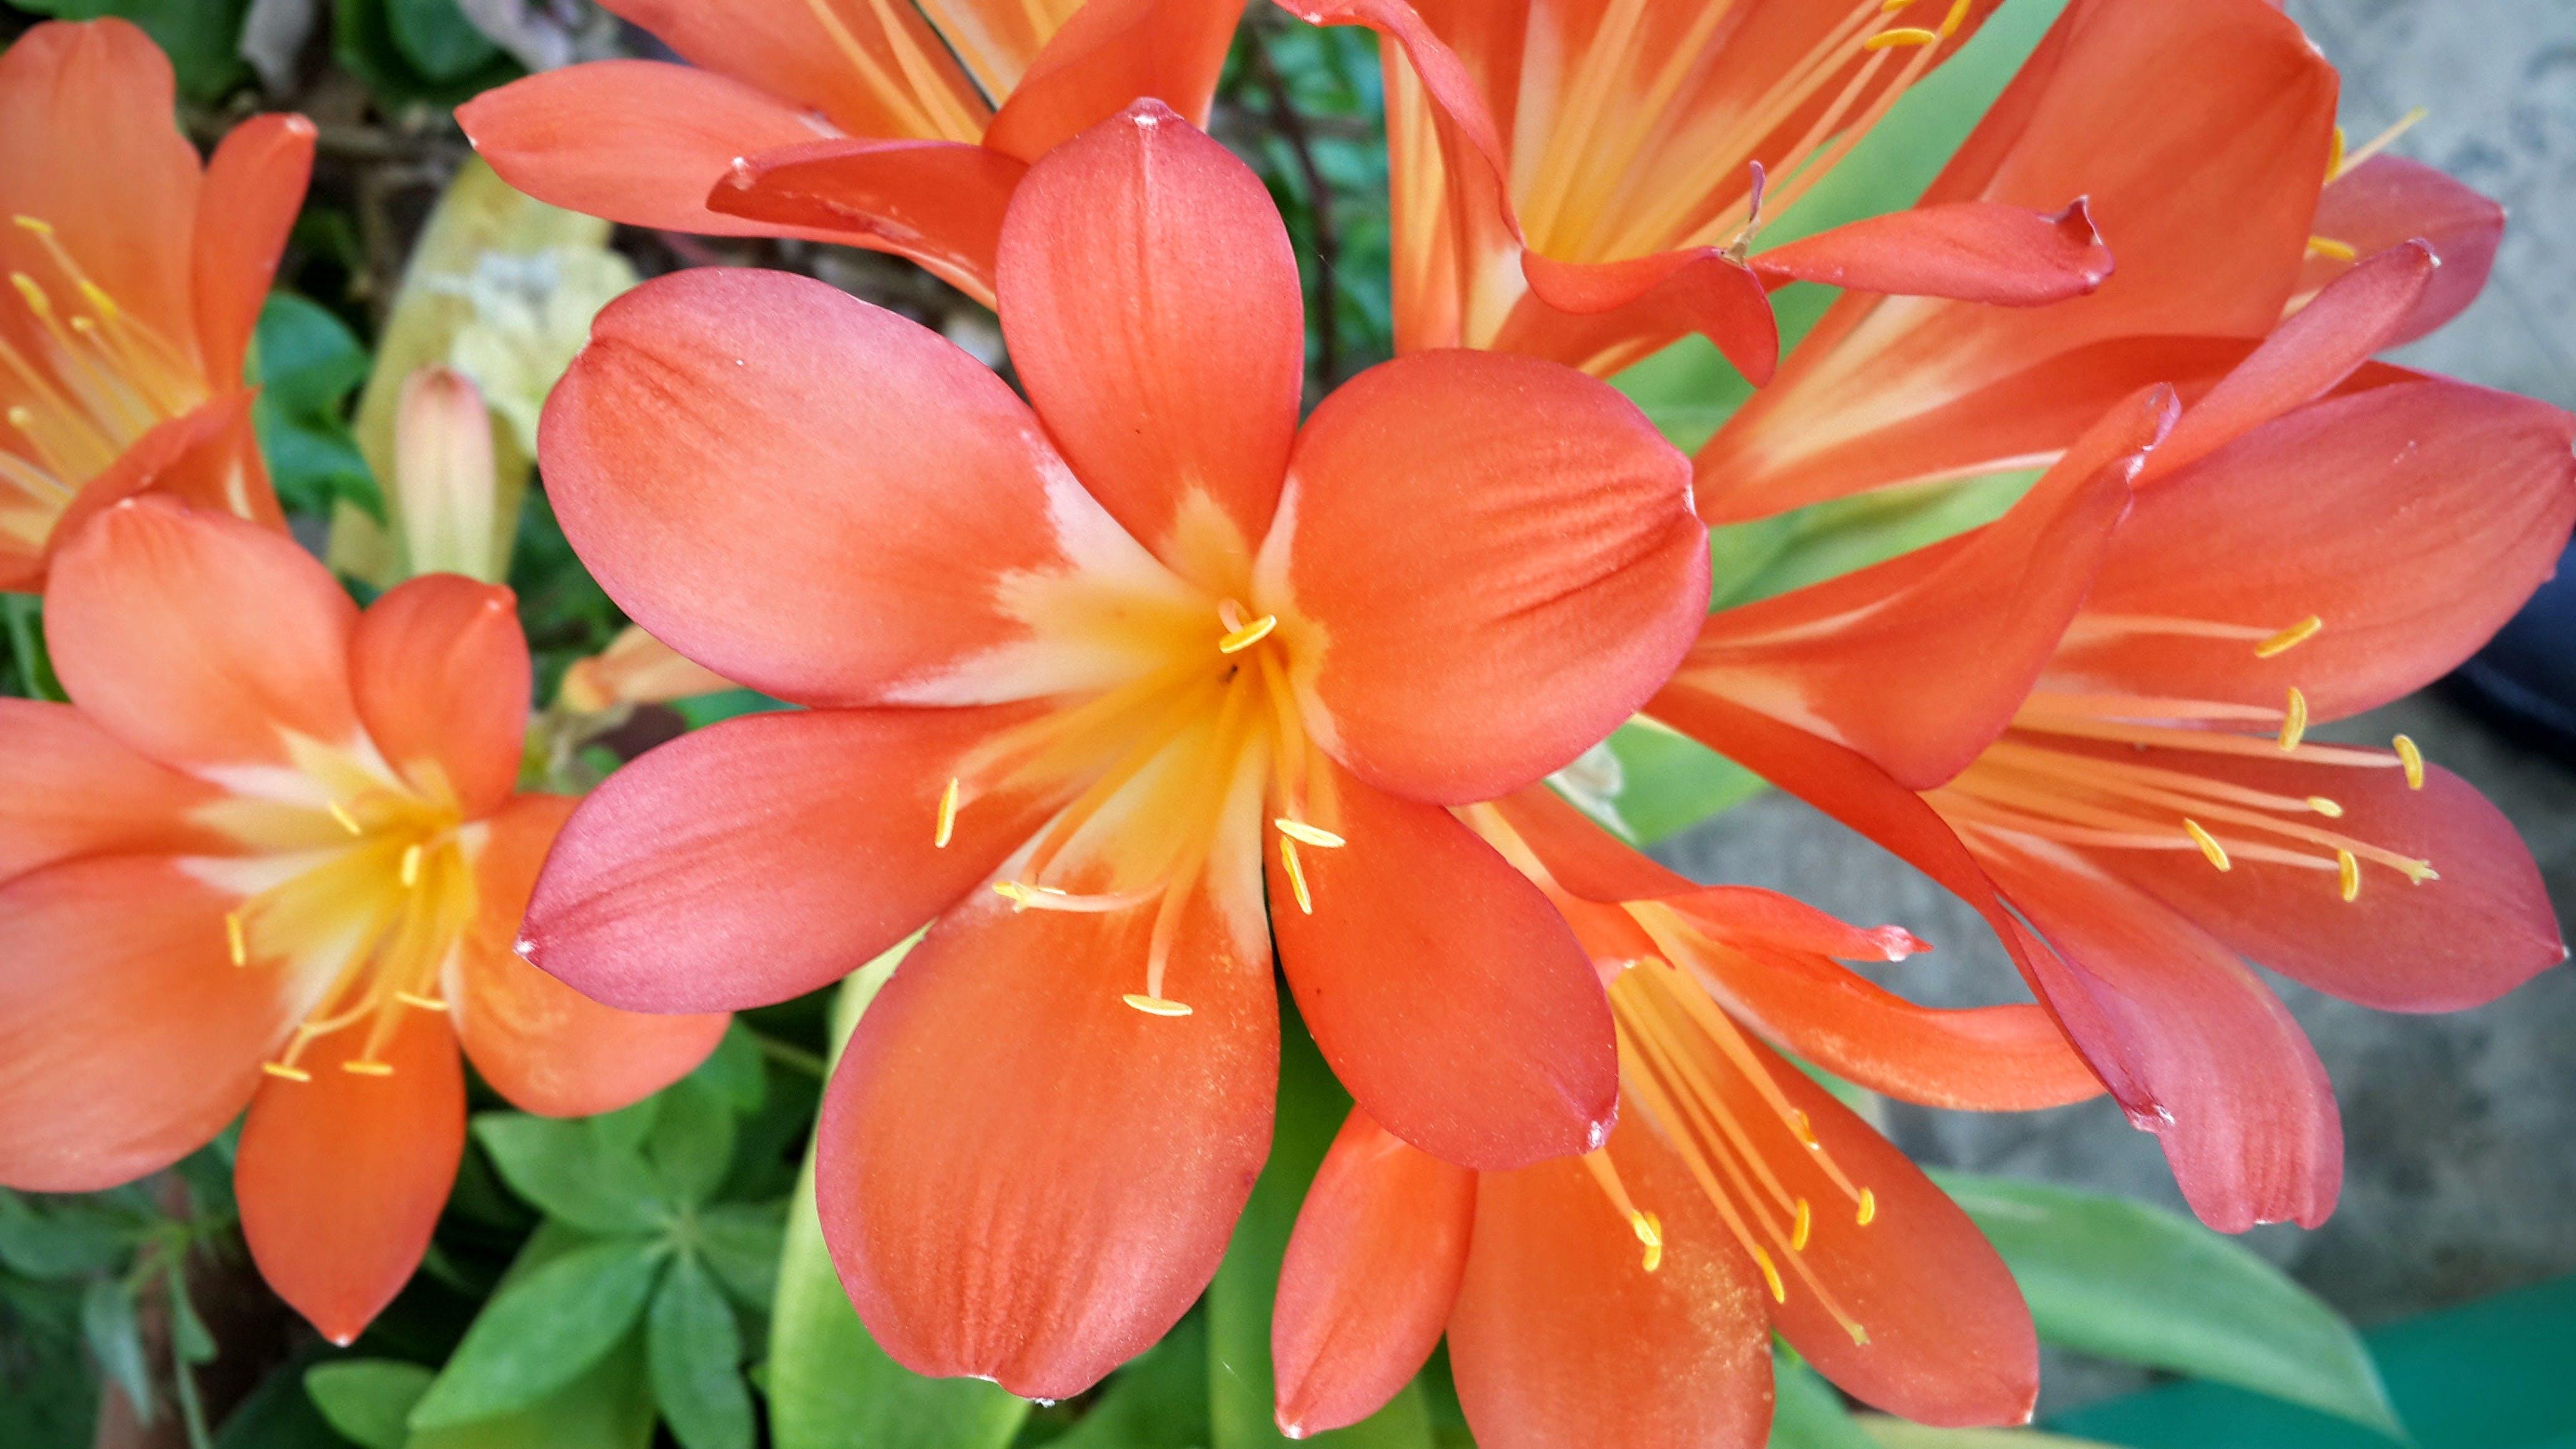 Free stock photo of flowers, orange